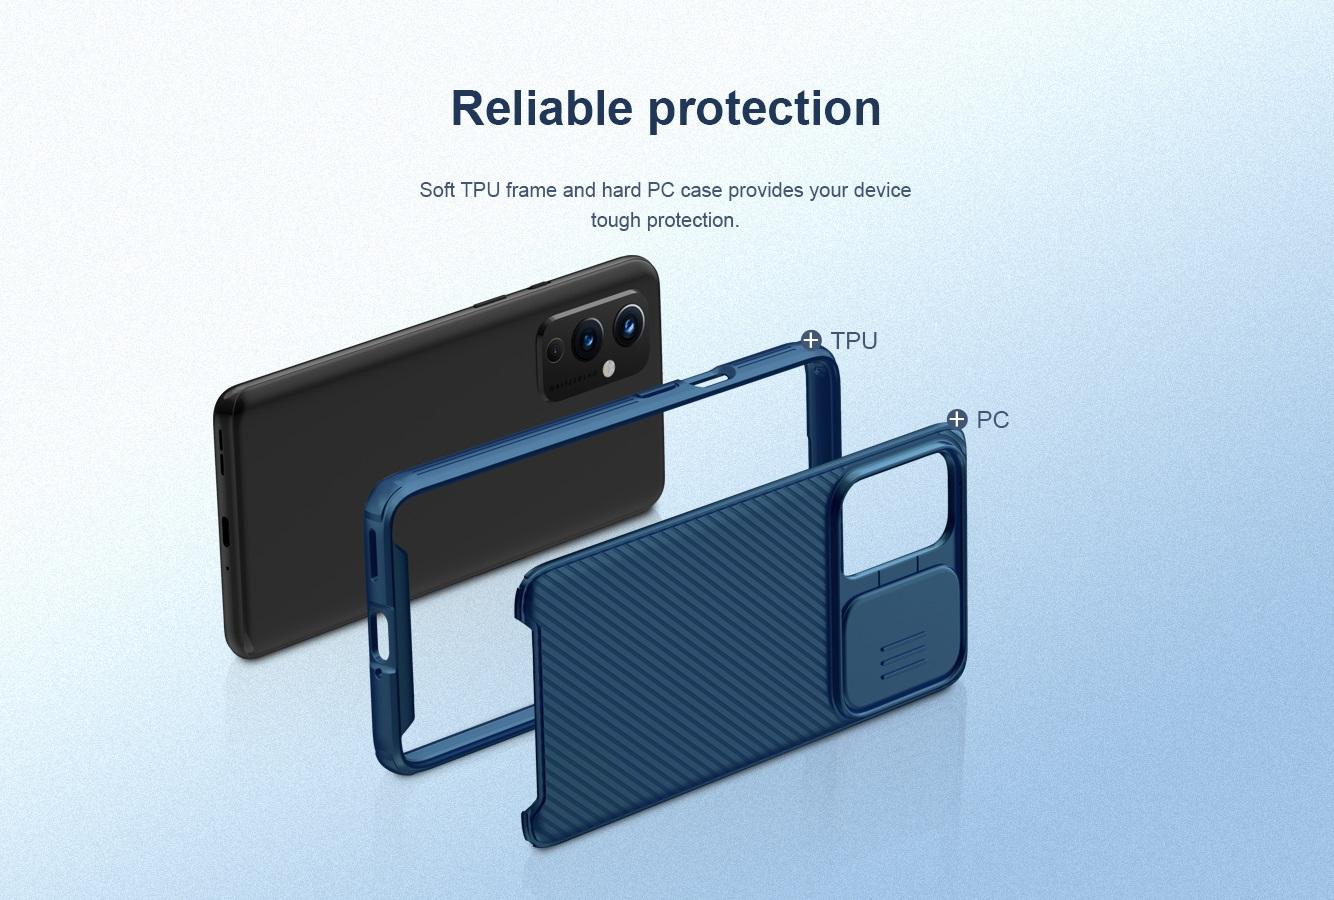 OnePlus_9_CamShield_Pro_Case-03.jpg